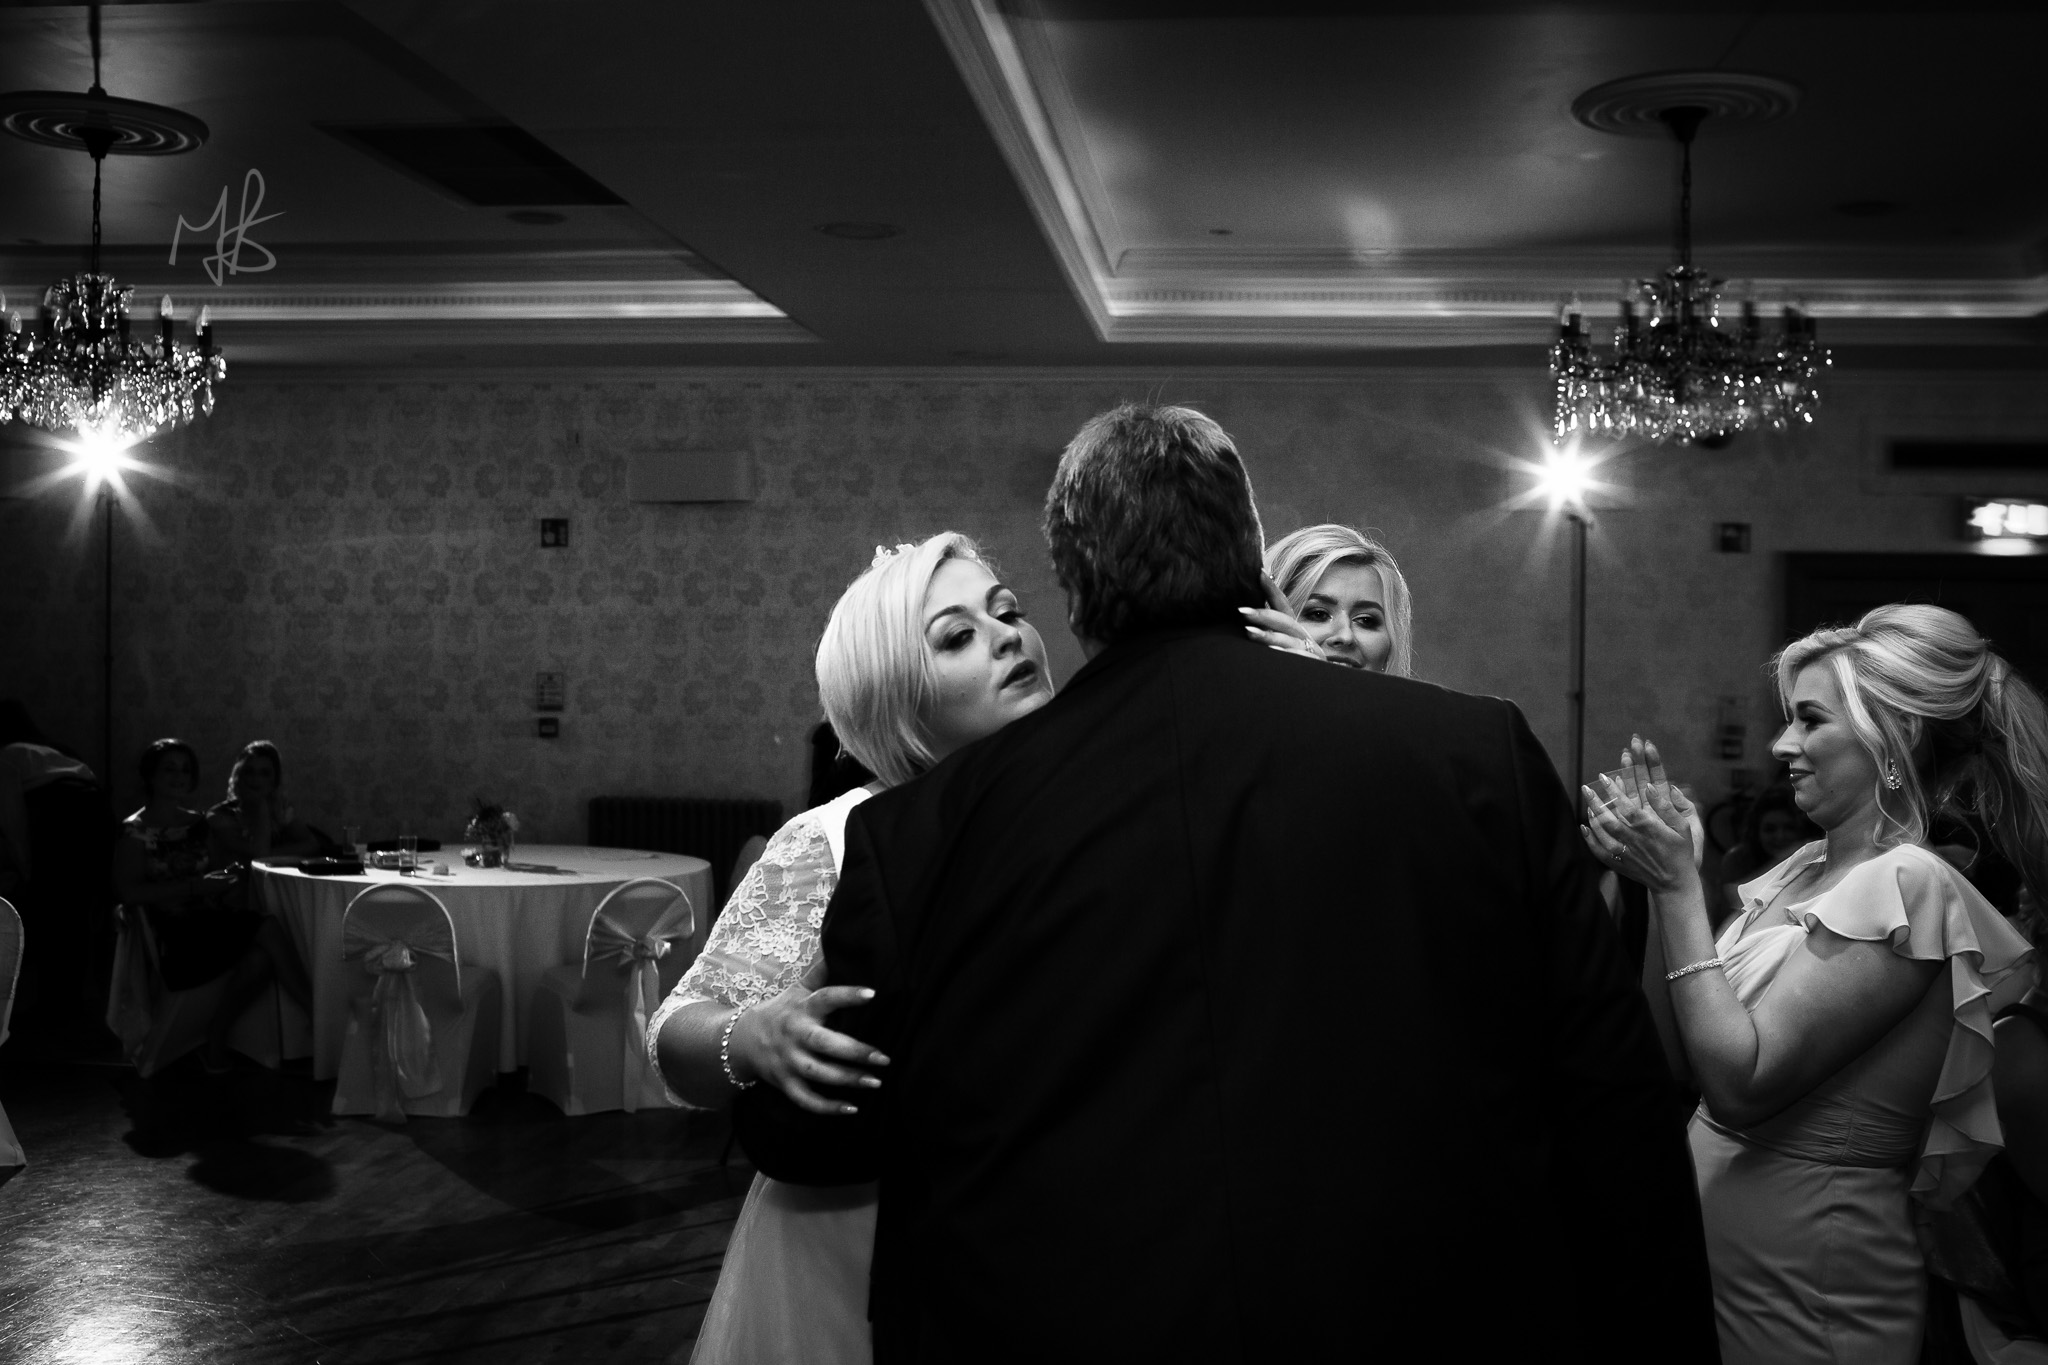 Northern-Ireland-Wedding-Photographer-Mark-Barnes-Ballymena_wedding-photography-Leighinmohr-House-Seamas_Alanna_For-web-62.jpg